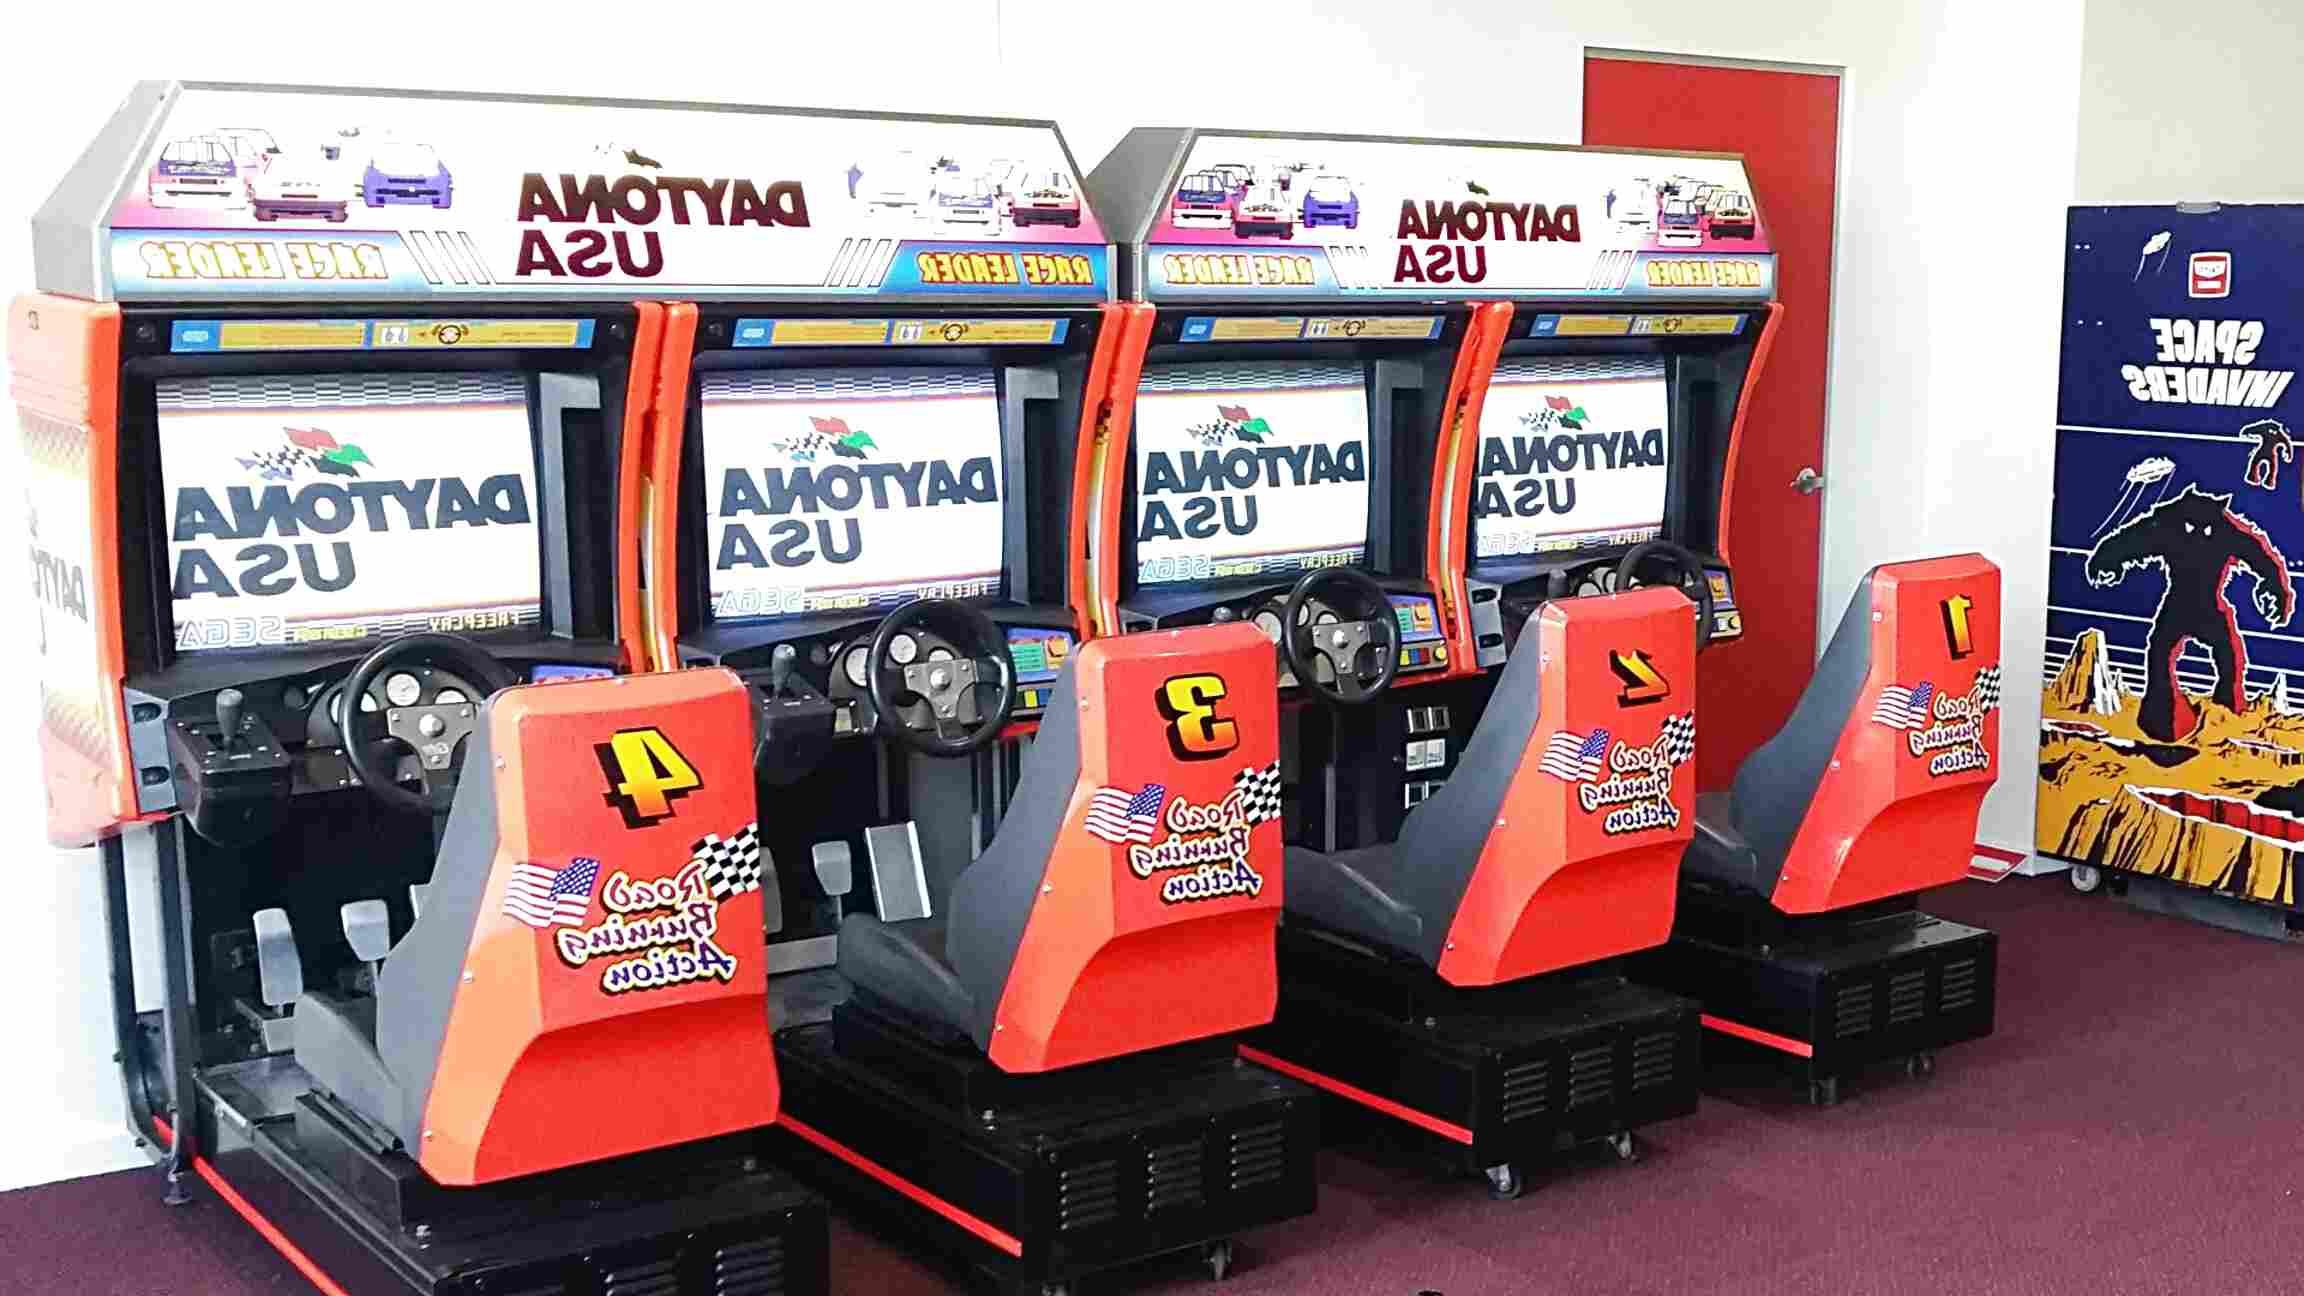 daytona arcade game for sale